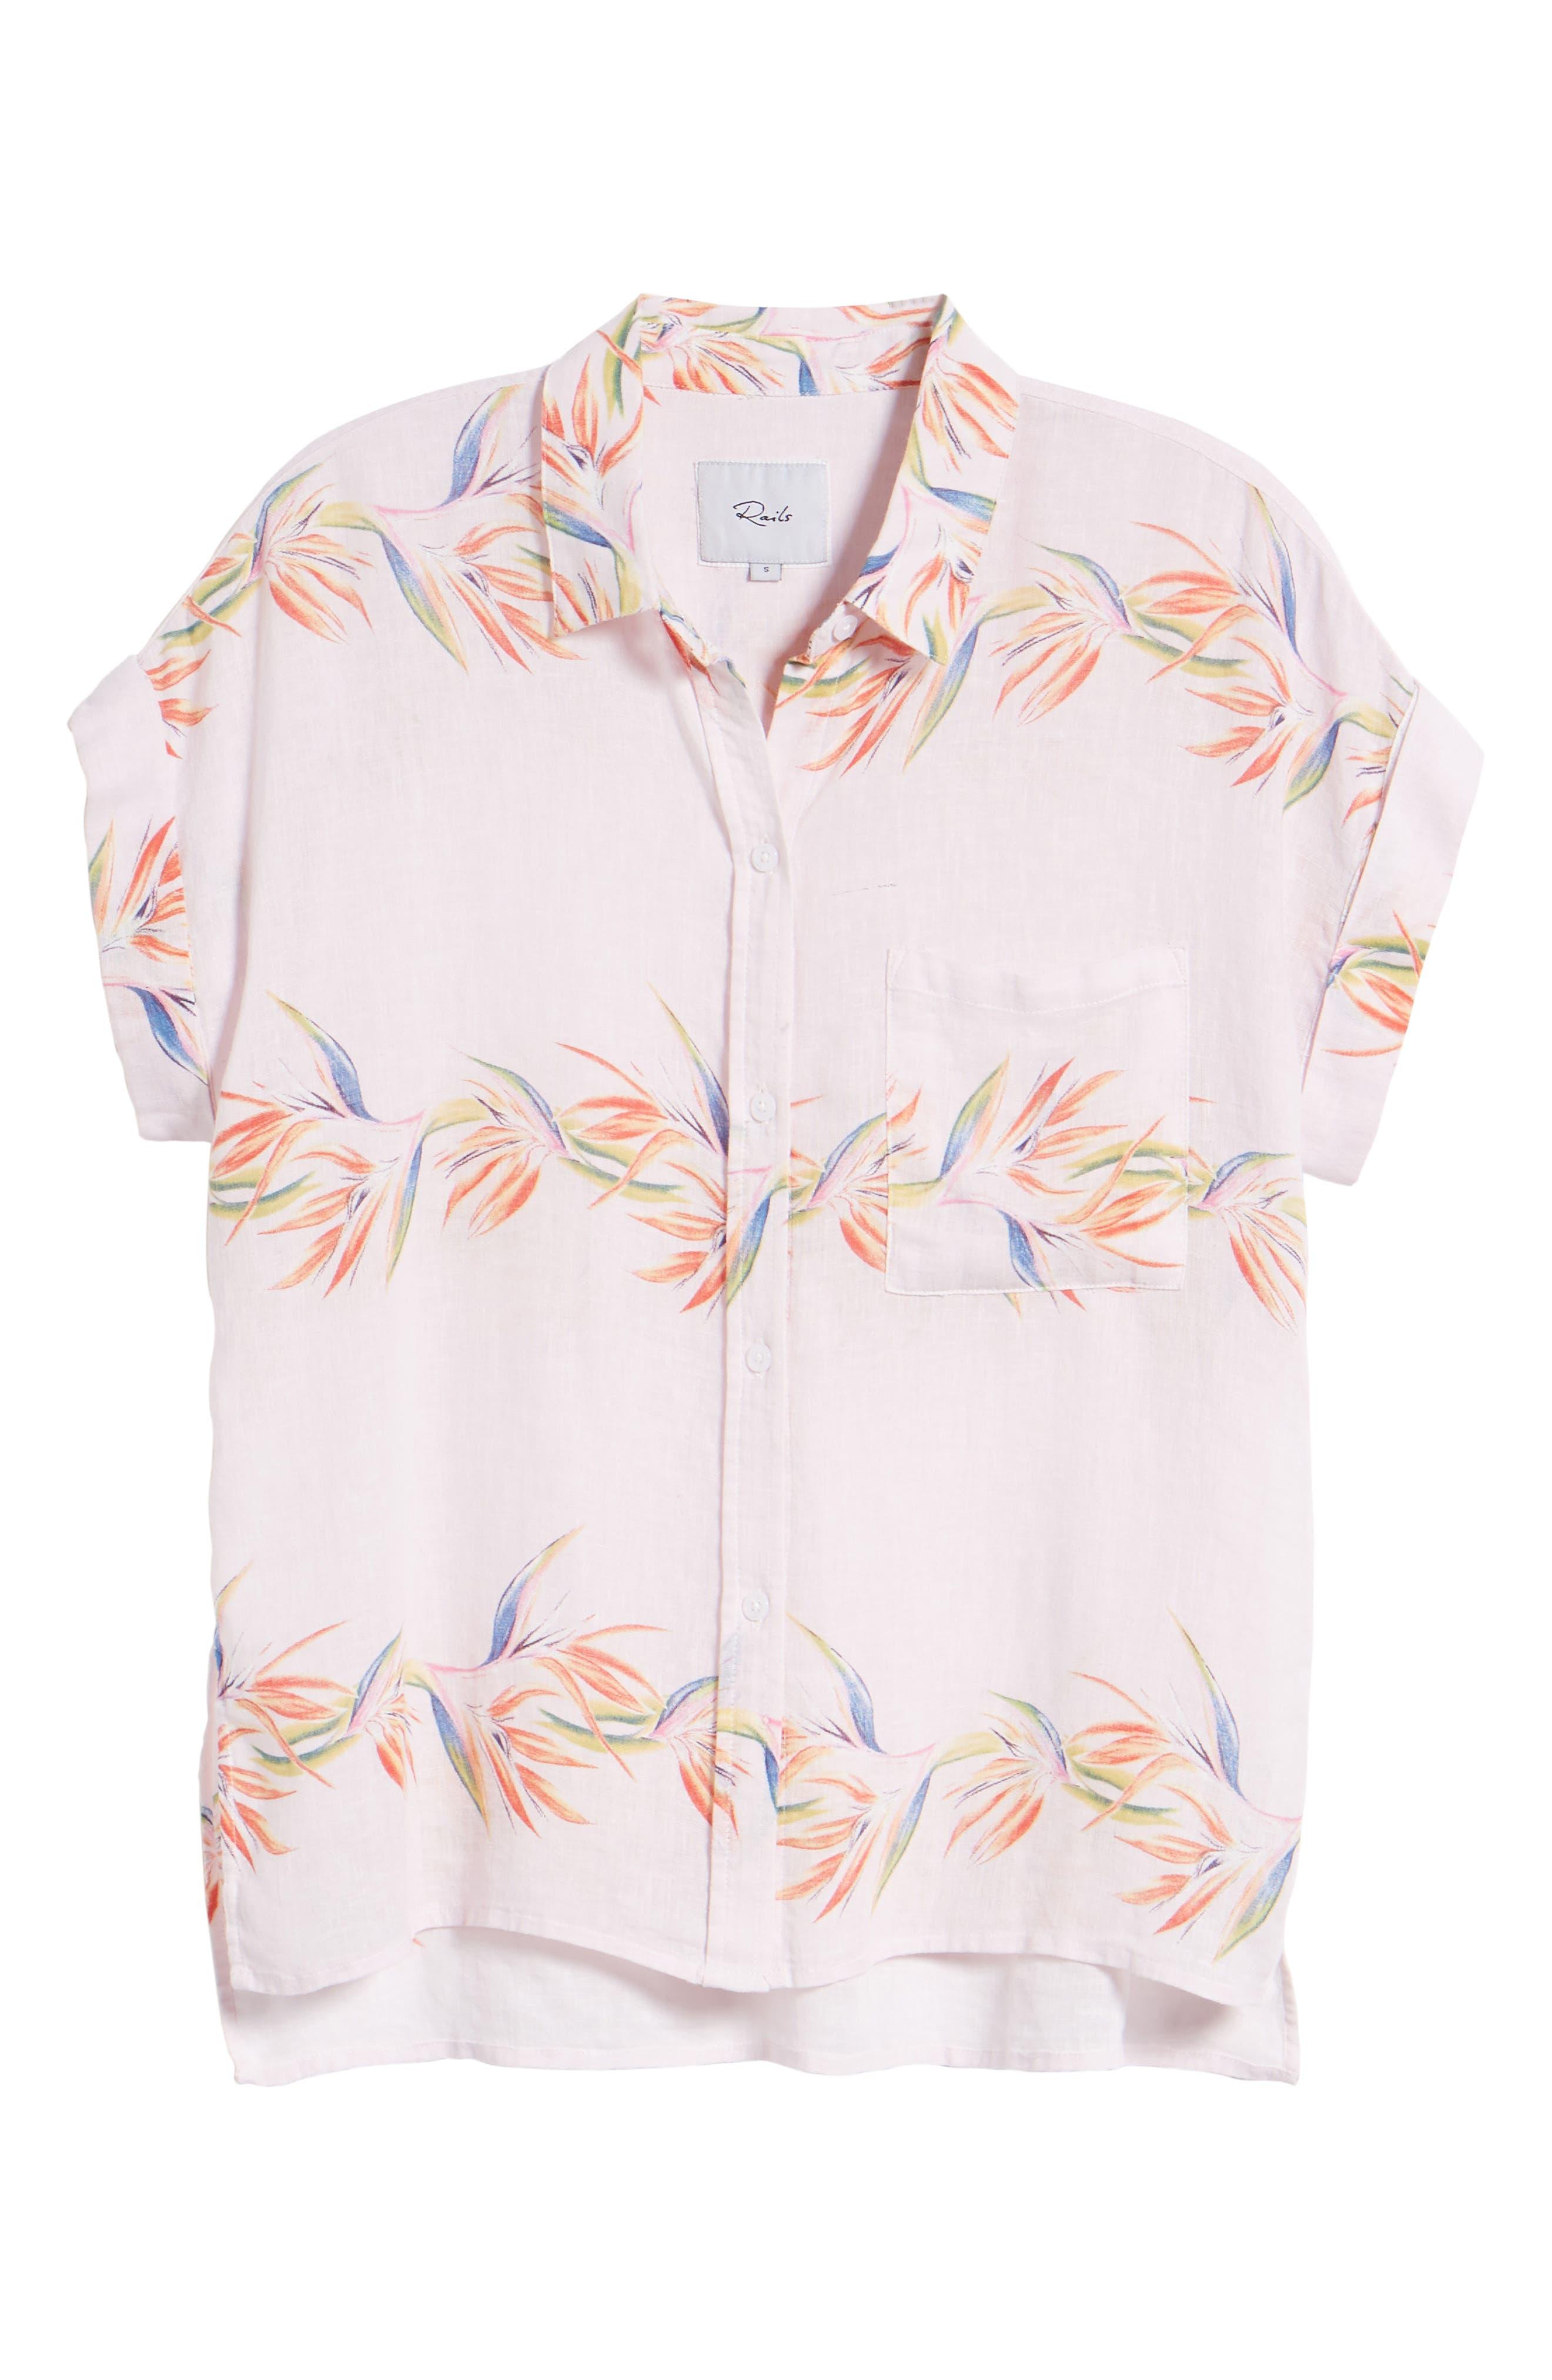 Whitney Print Shirt,                             Alternate thumbnail 7, color,                             BLUSH BIRDS OF PARADISE